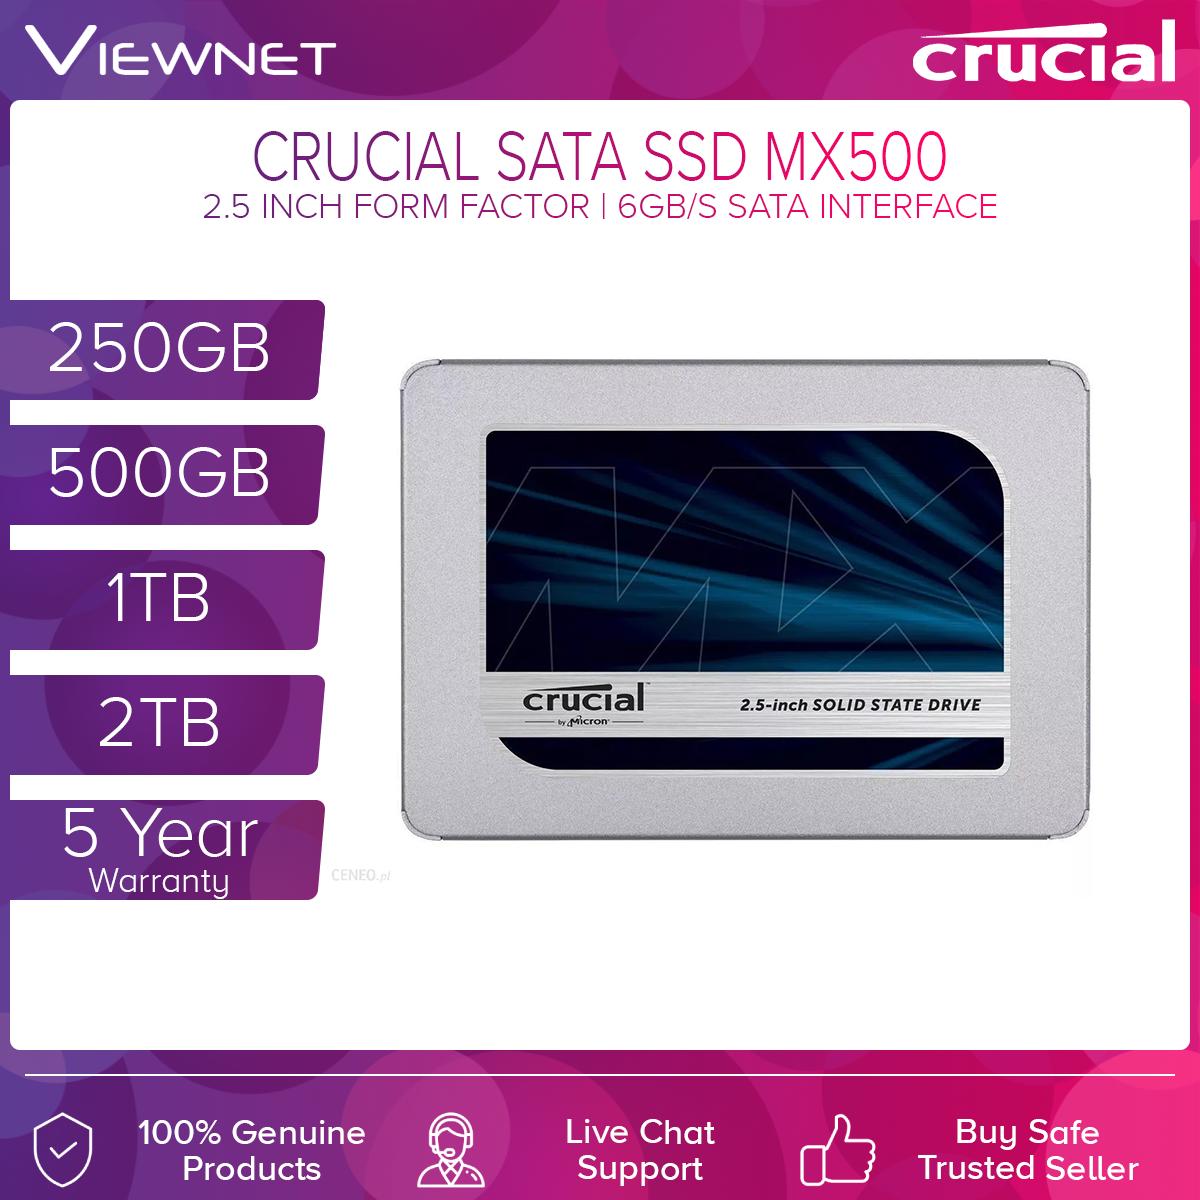 Crucial MX500 SATA 2.5-inch 7mm (with 9.5mm adapter) Internal SSD (560 MB/s Read 510 MB/s Write) -250GB/500GB/1TB/2TB